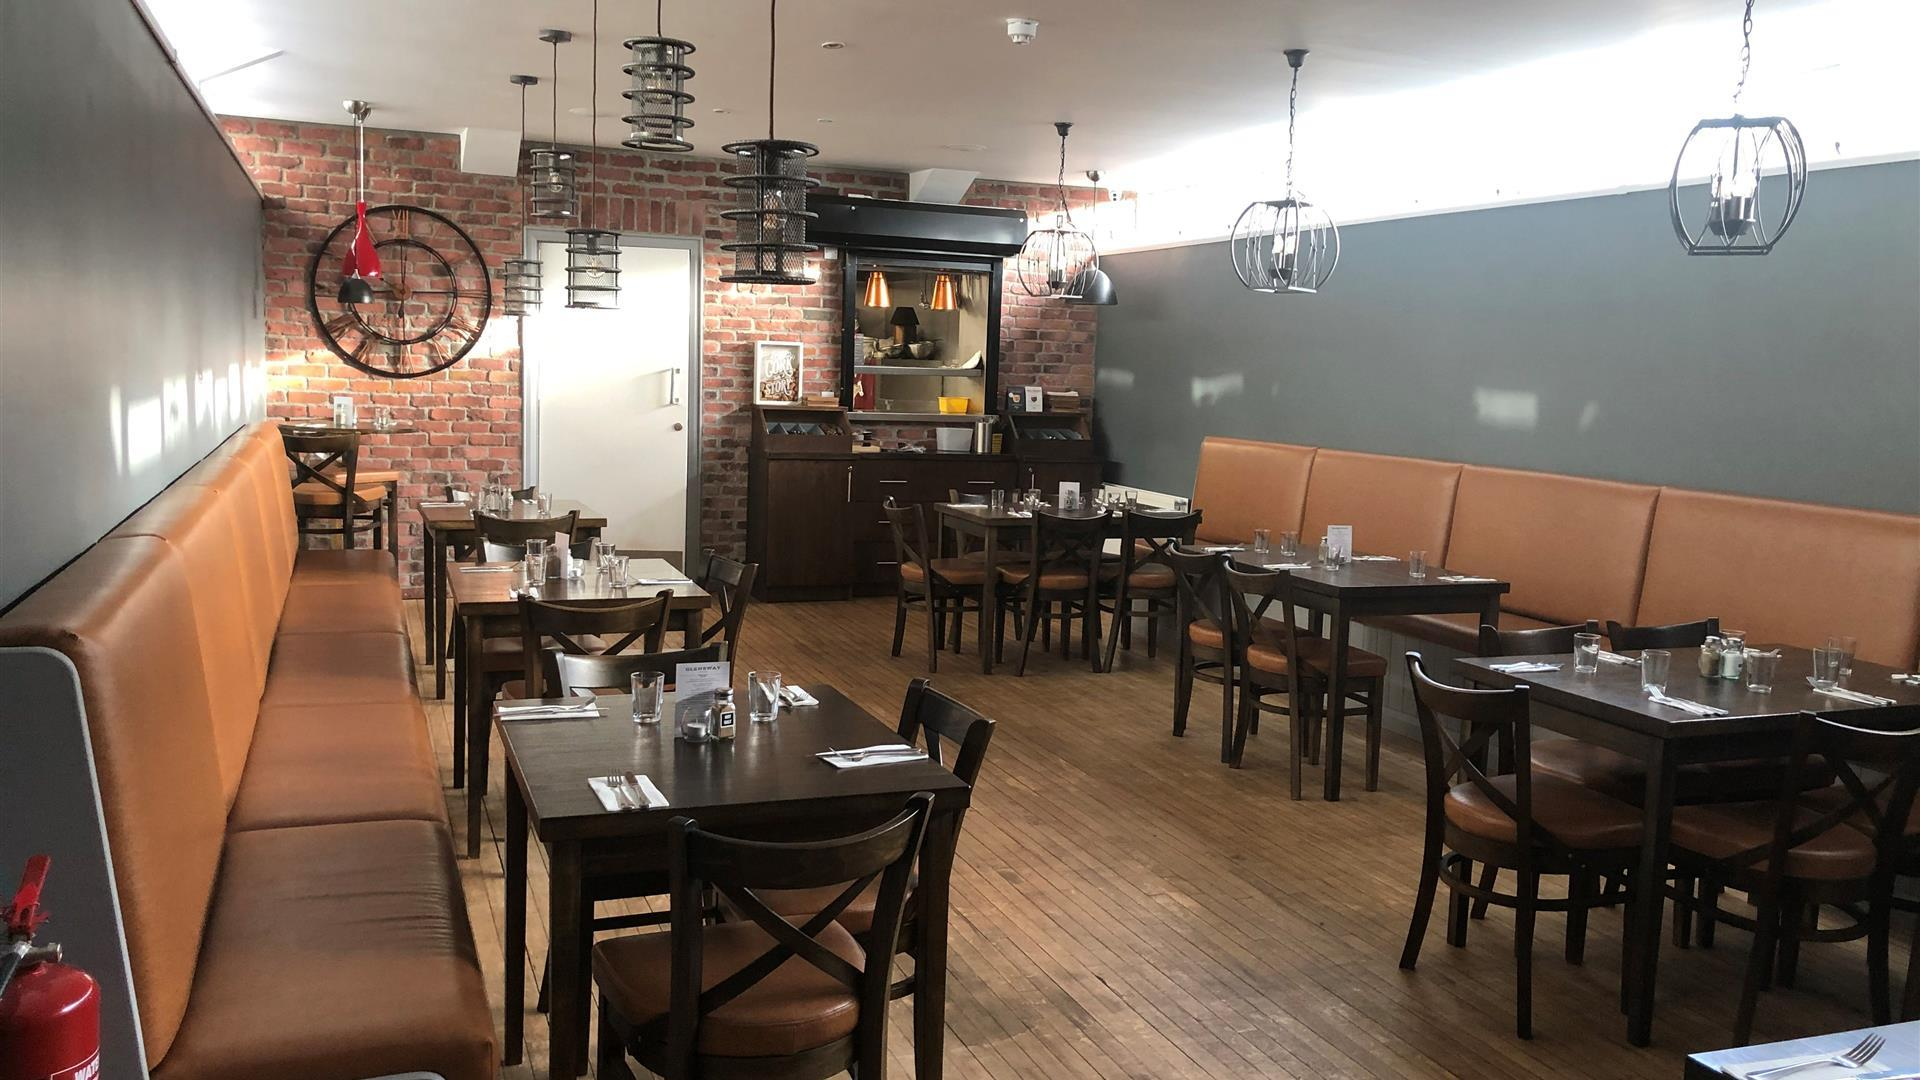 The Glensway Tavern